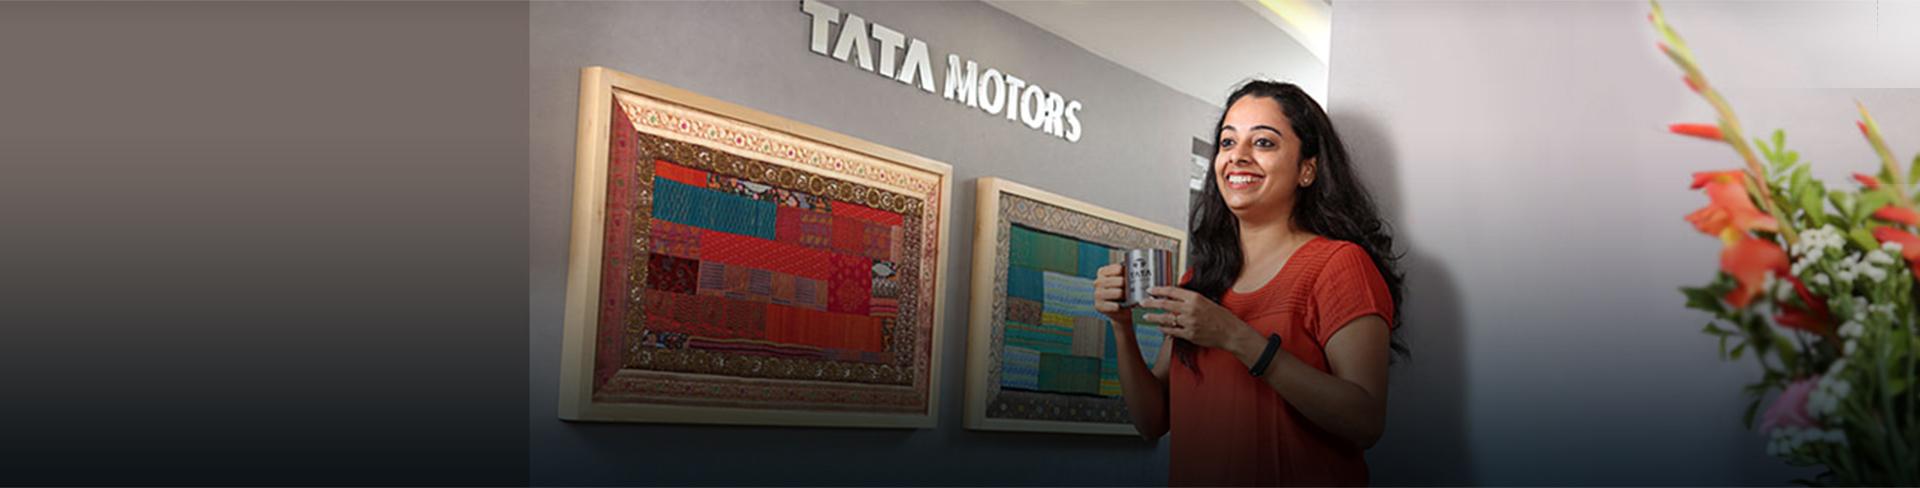 People at Tata Motors